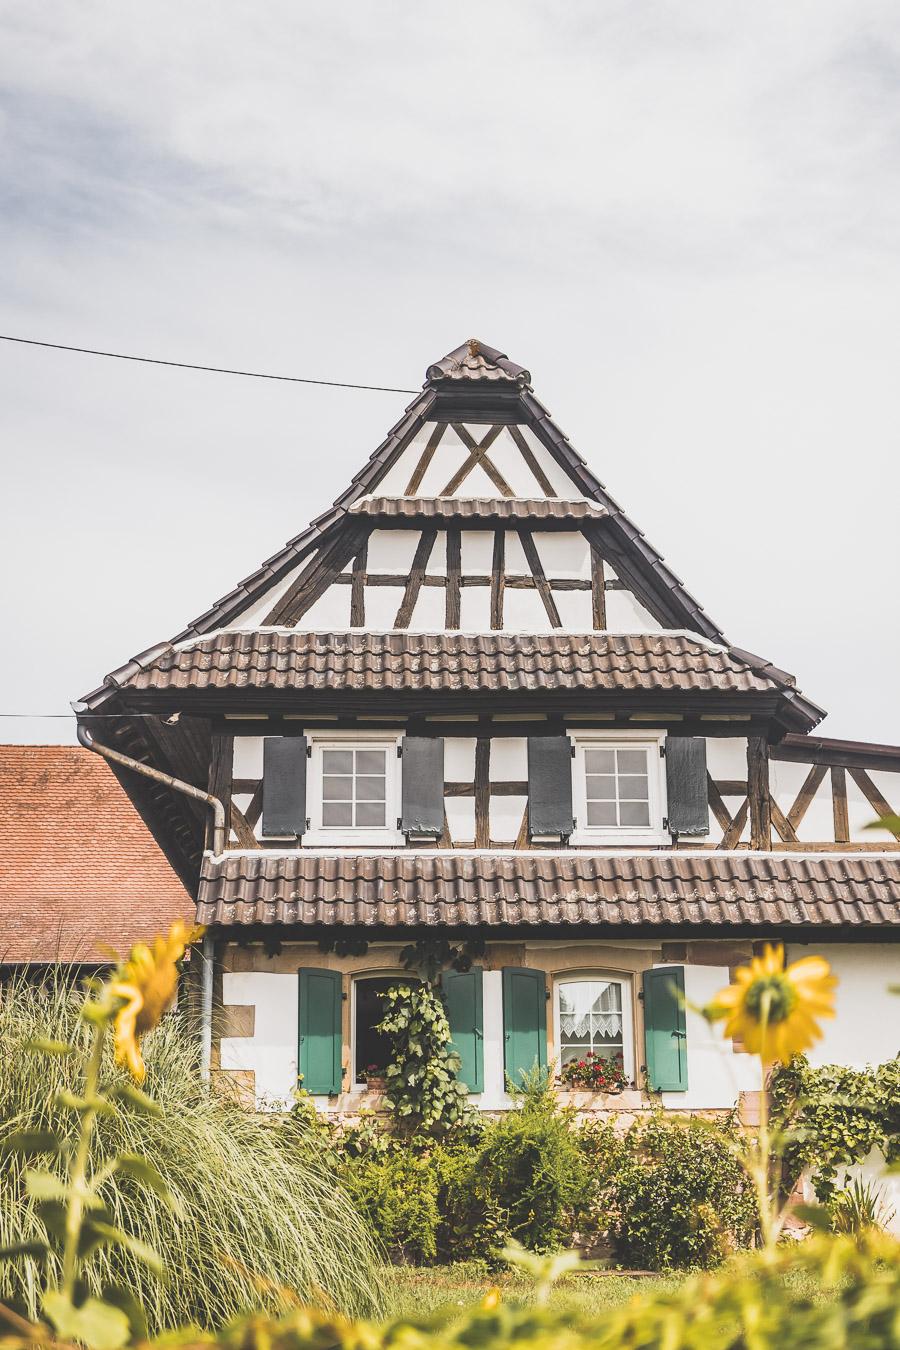 Visiter le Bas-Rhin